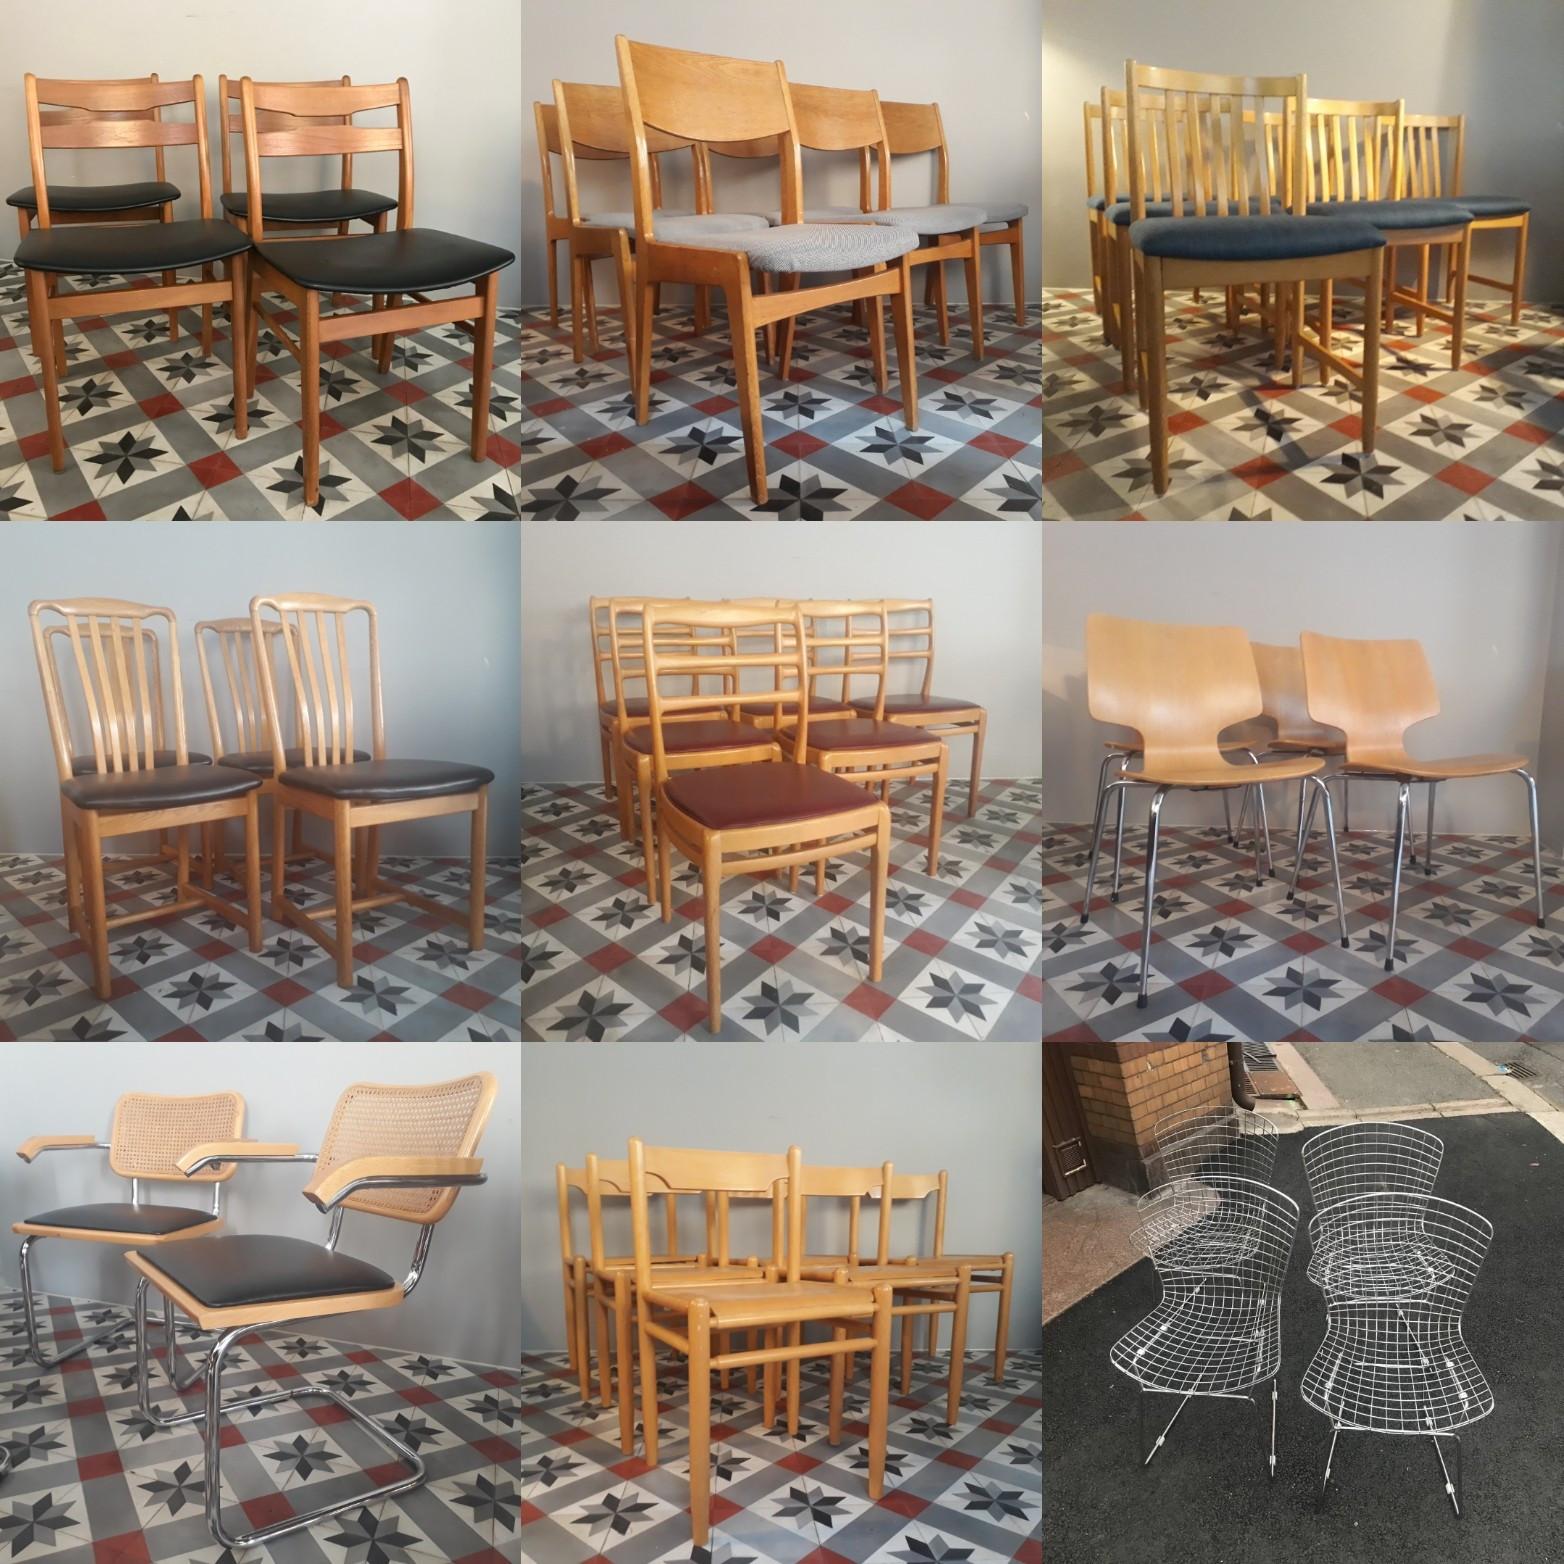 Vintage talienske Chiavari stoler   FINN.no